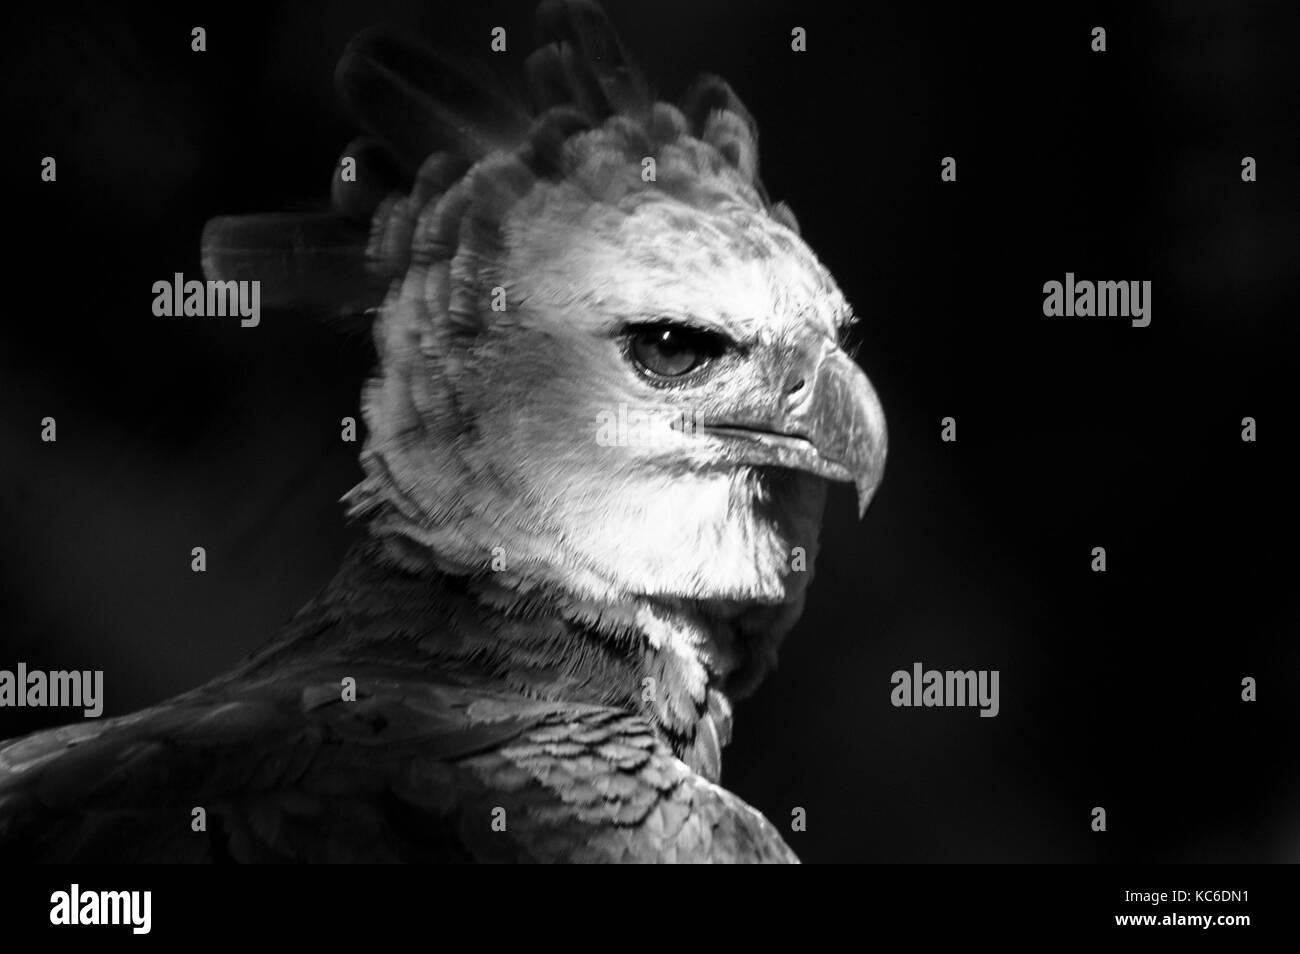 Black and white image of the harpy eagle the national bird of Panama - Stock Image